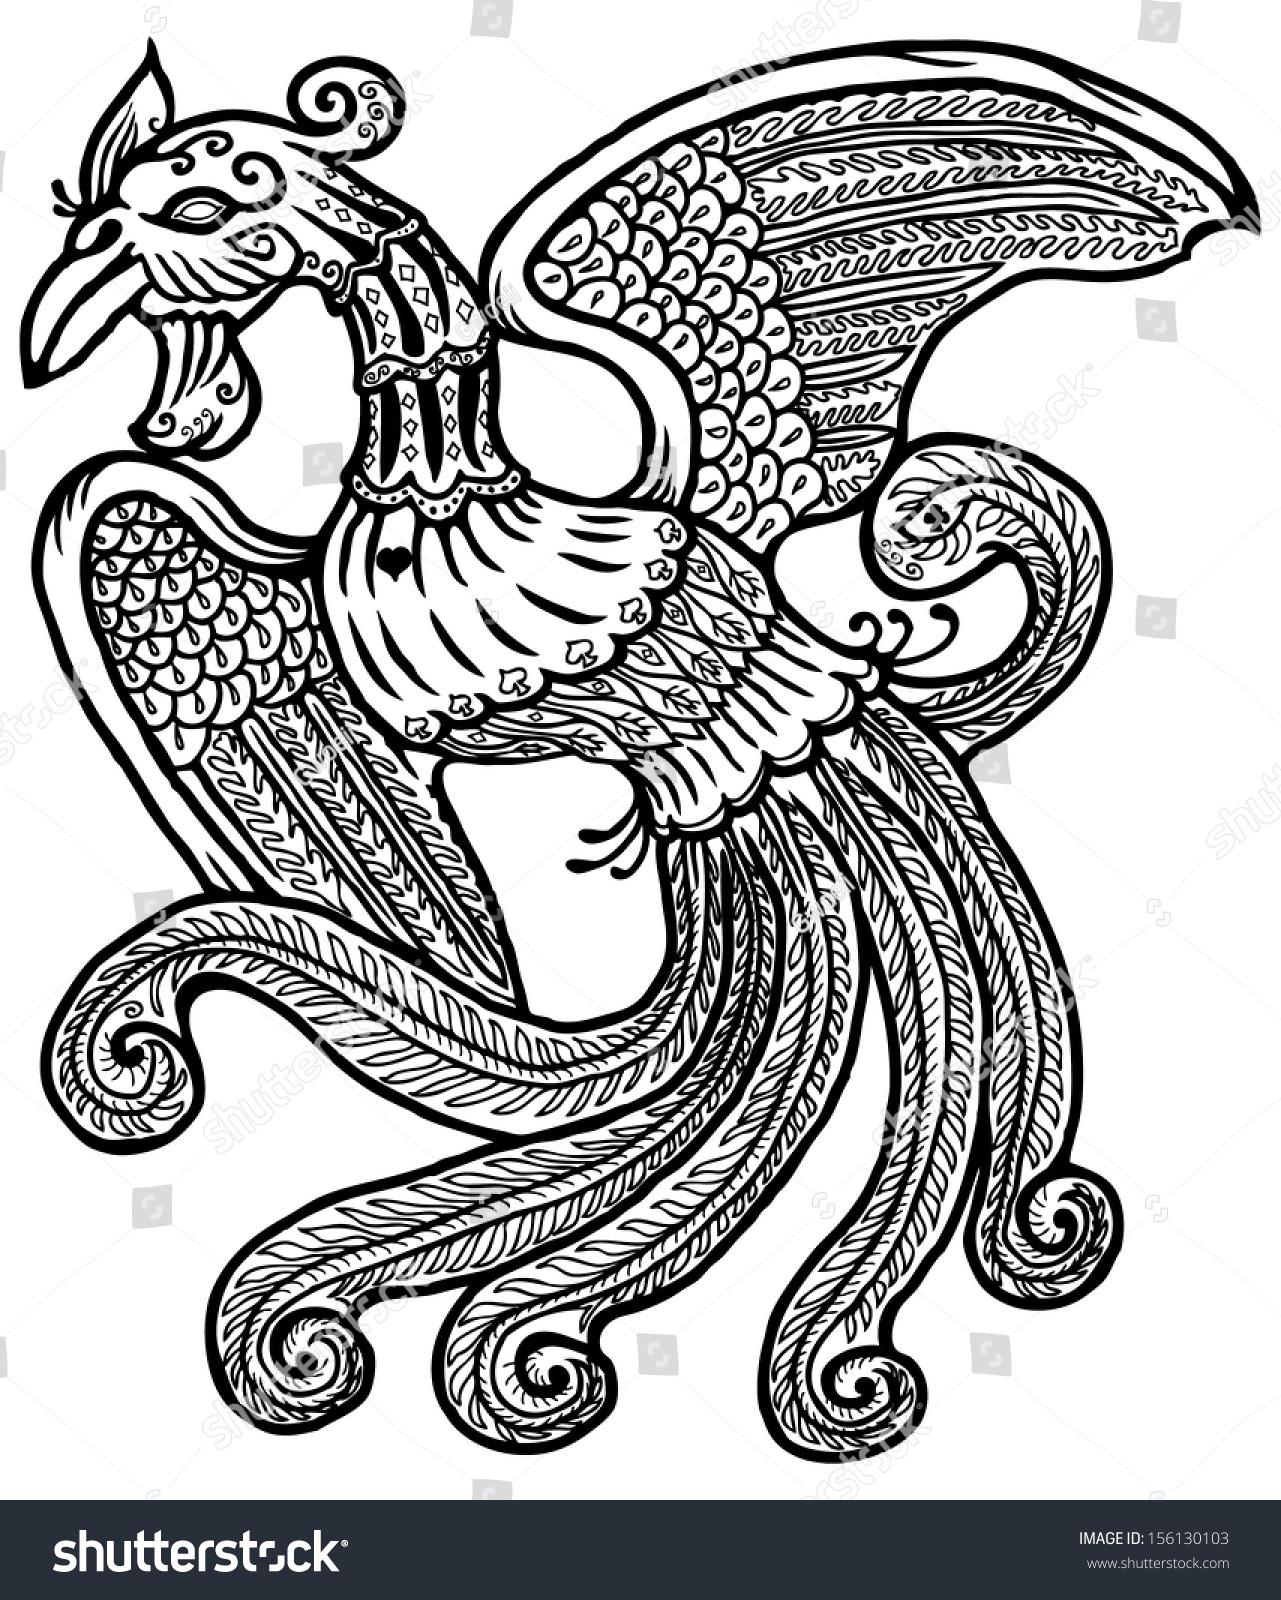 Cartoon Ancient Exotic Mythical Phoenix Bird Stock Illustration